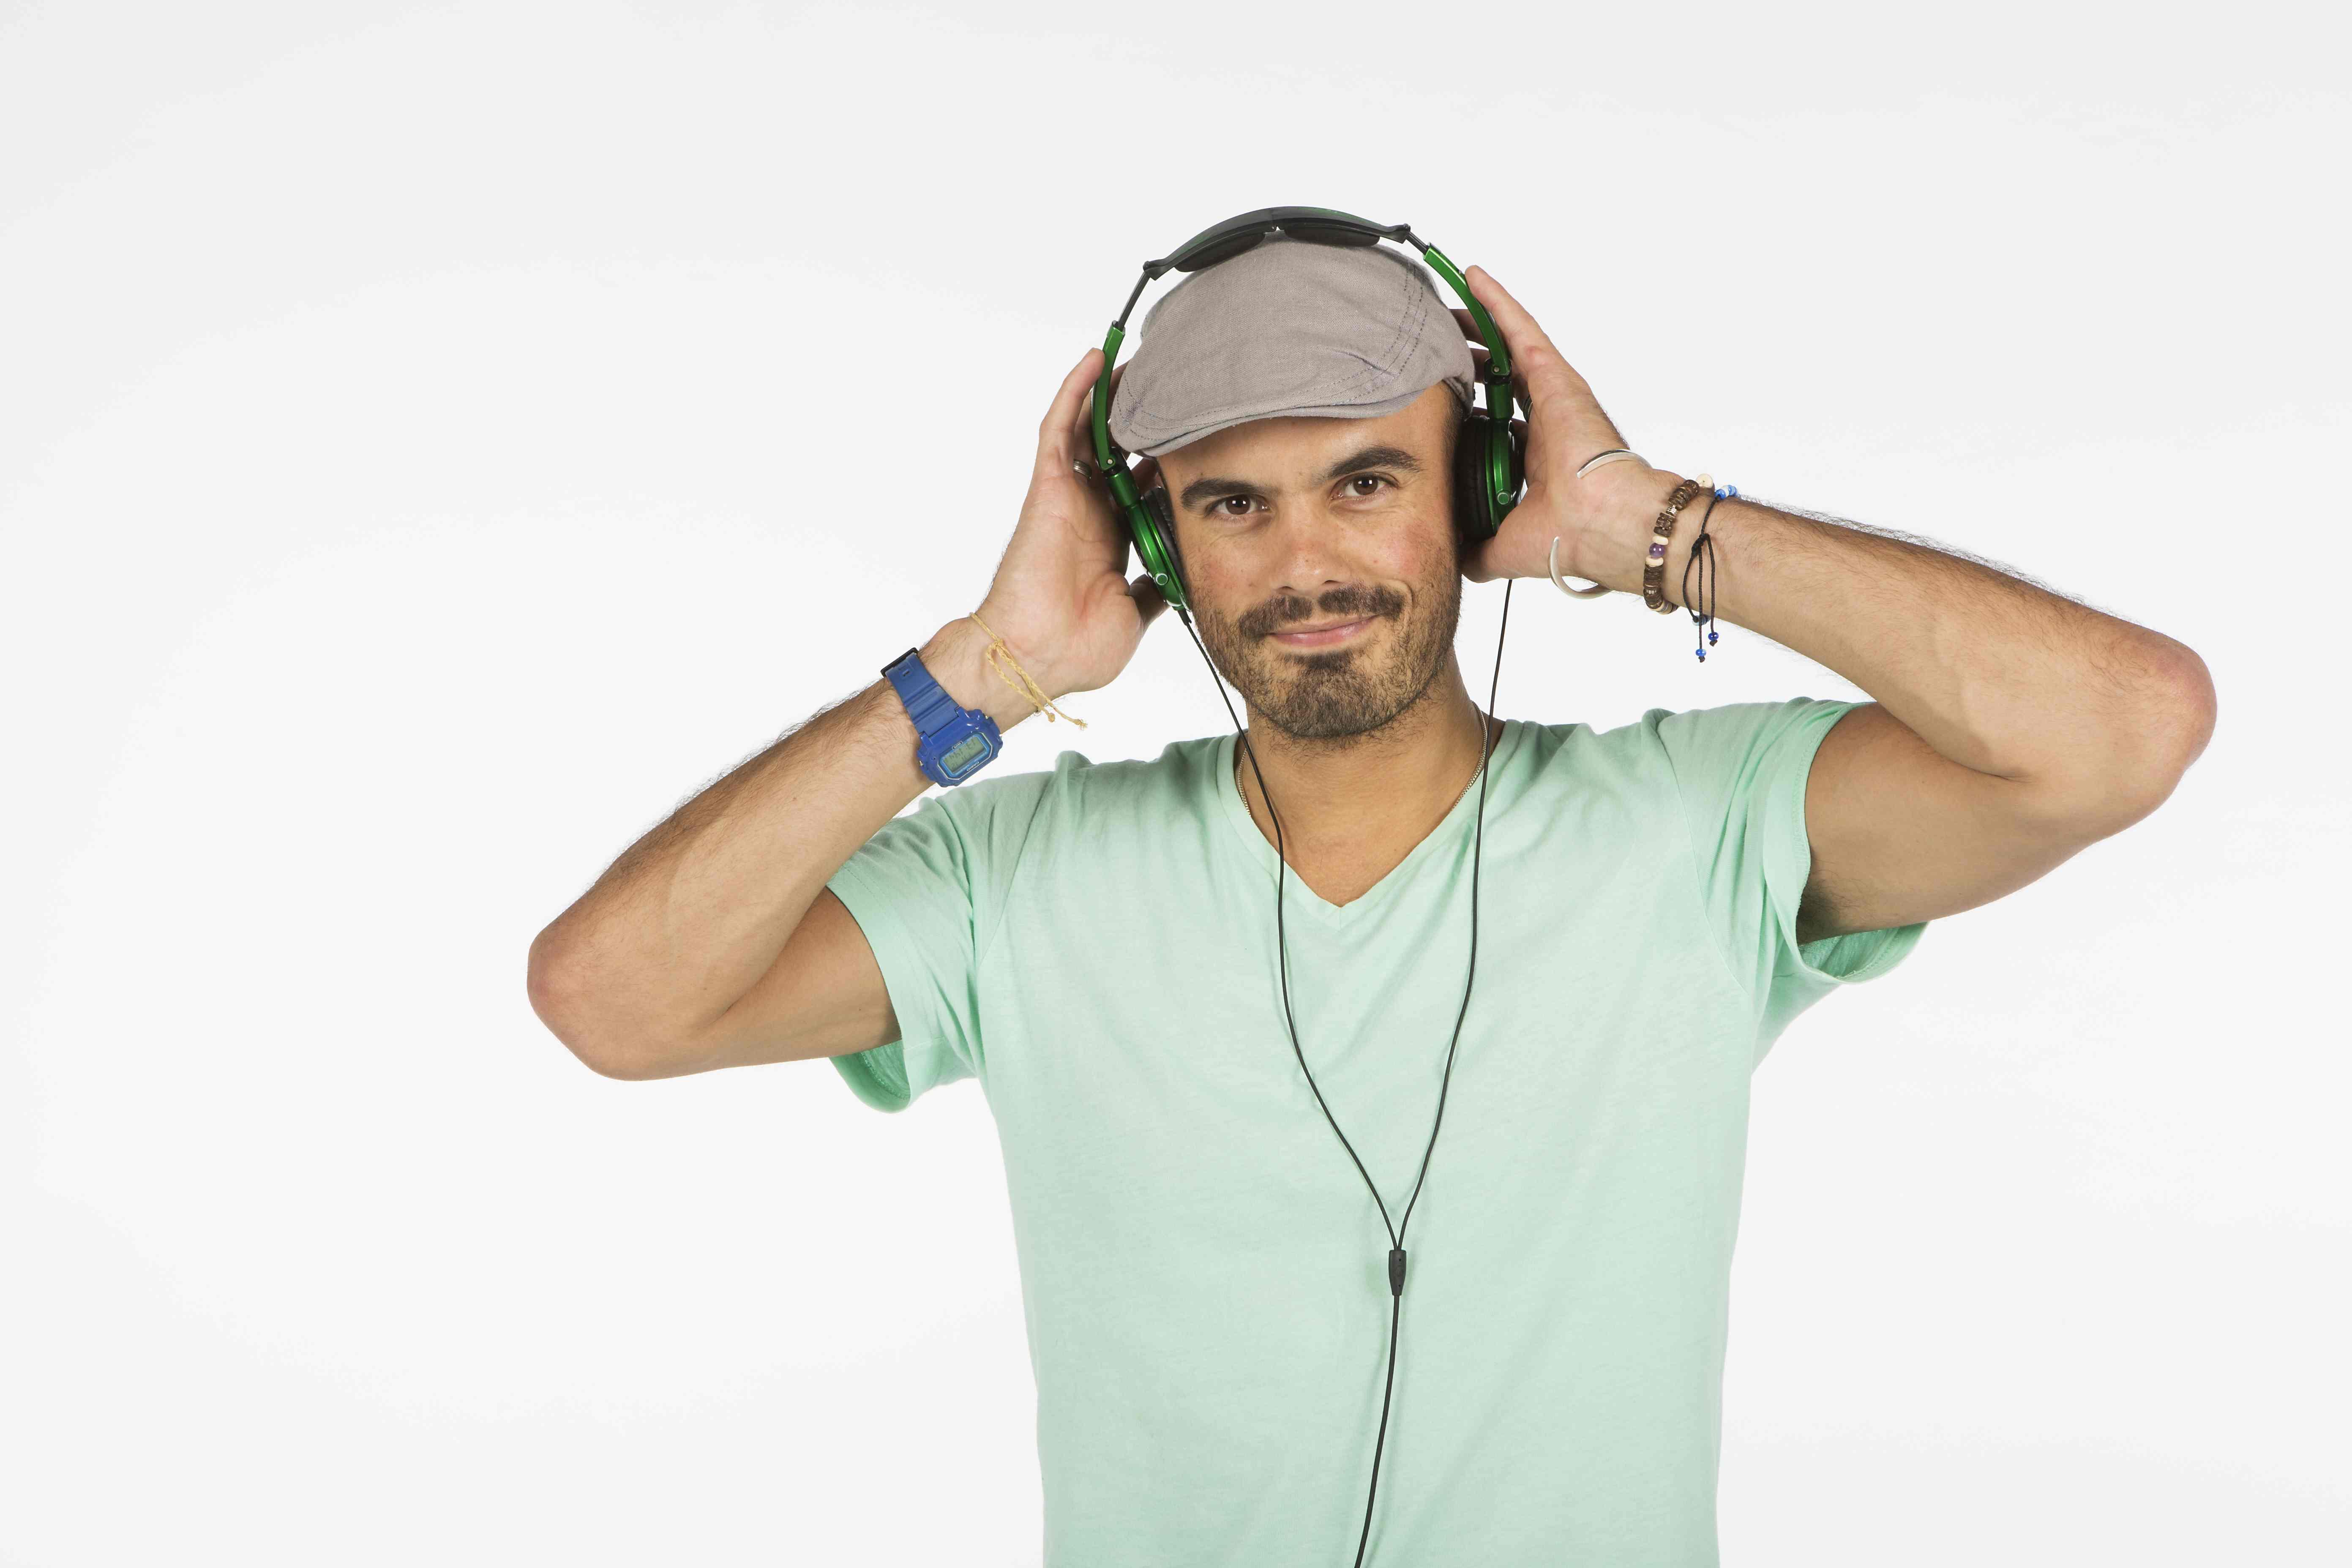 Take part in a DJ crash course with Hoxton Radio DJ David Preesah